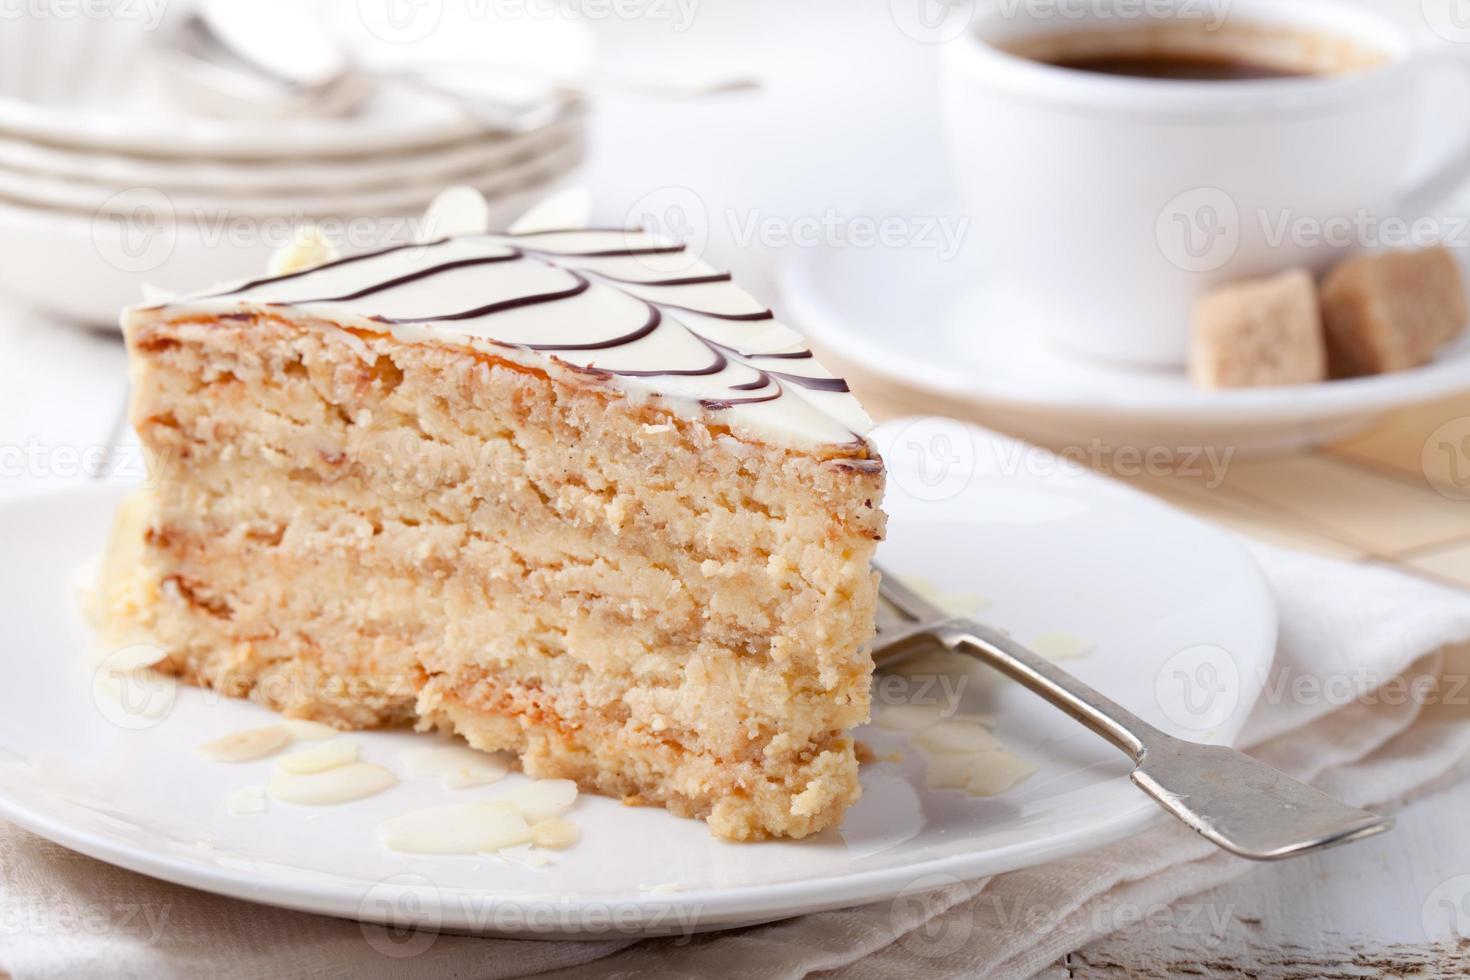 traditionele hongaarse esterhazy cake met koffiekopje en vintage ansichtkaarten foto